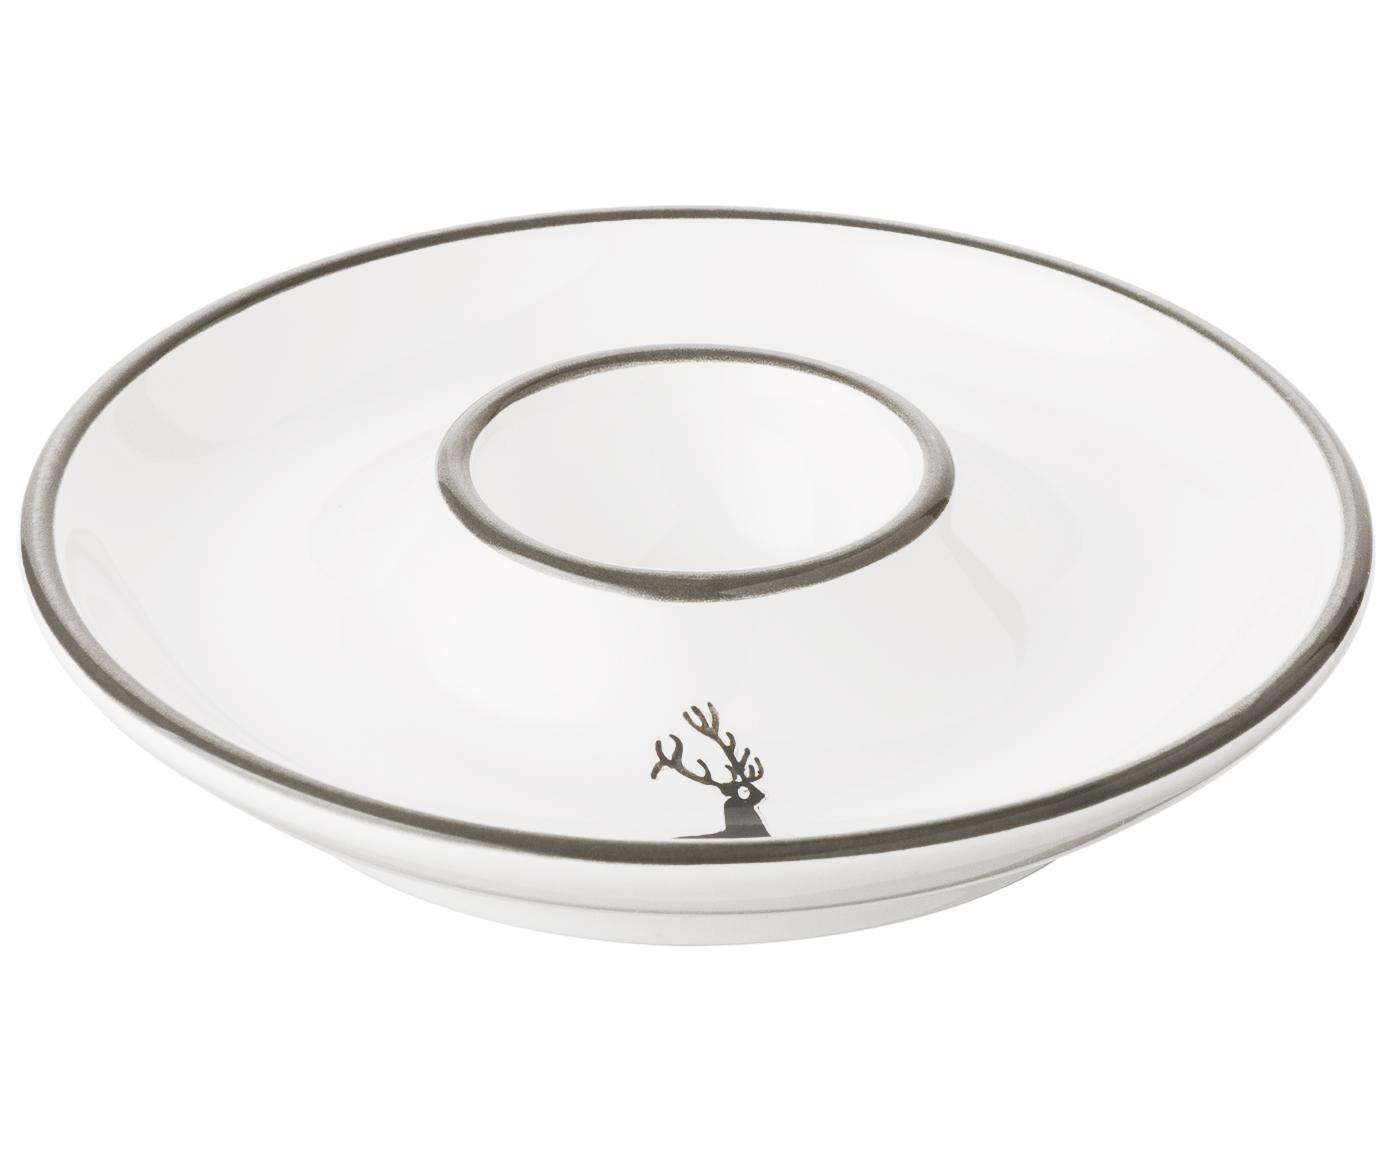 Portauovo Classic Grauer Hirsch, Ceramica, Grigio, bianco, Ø 12 cm